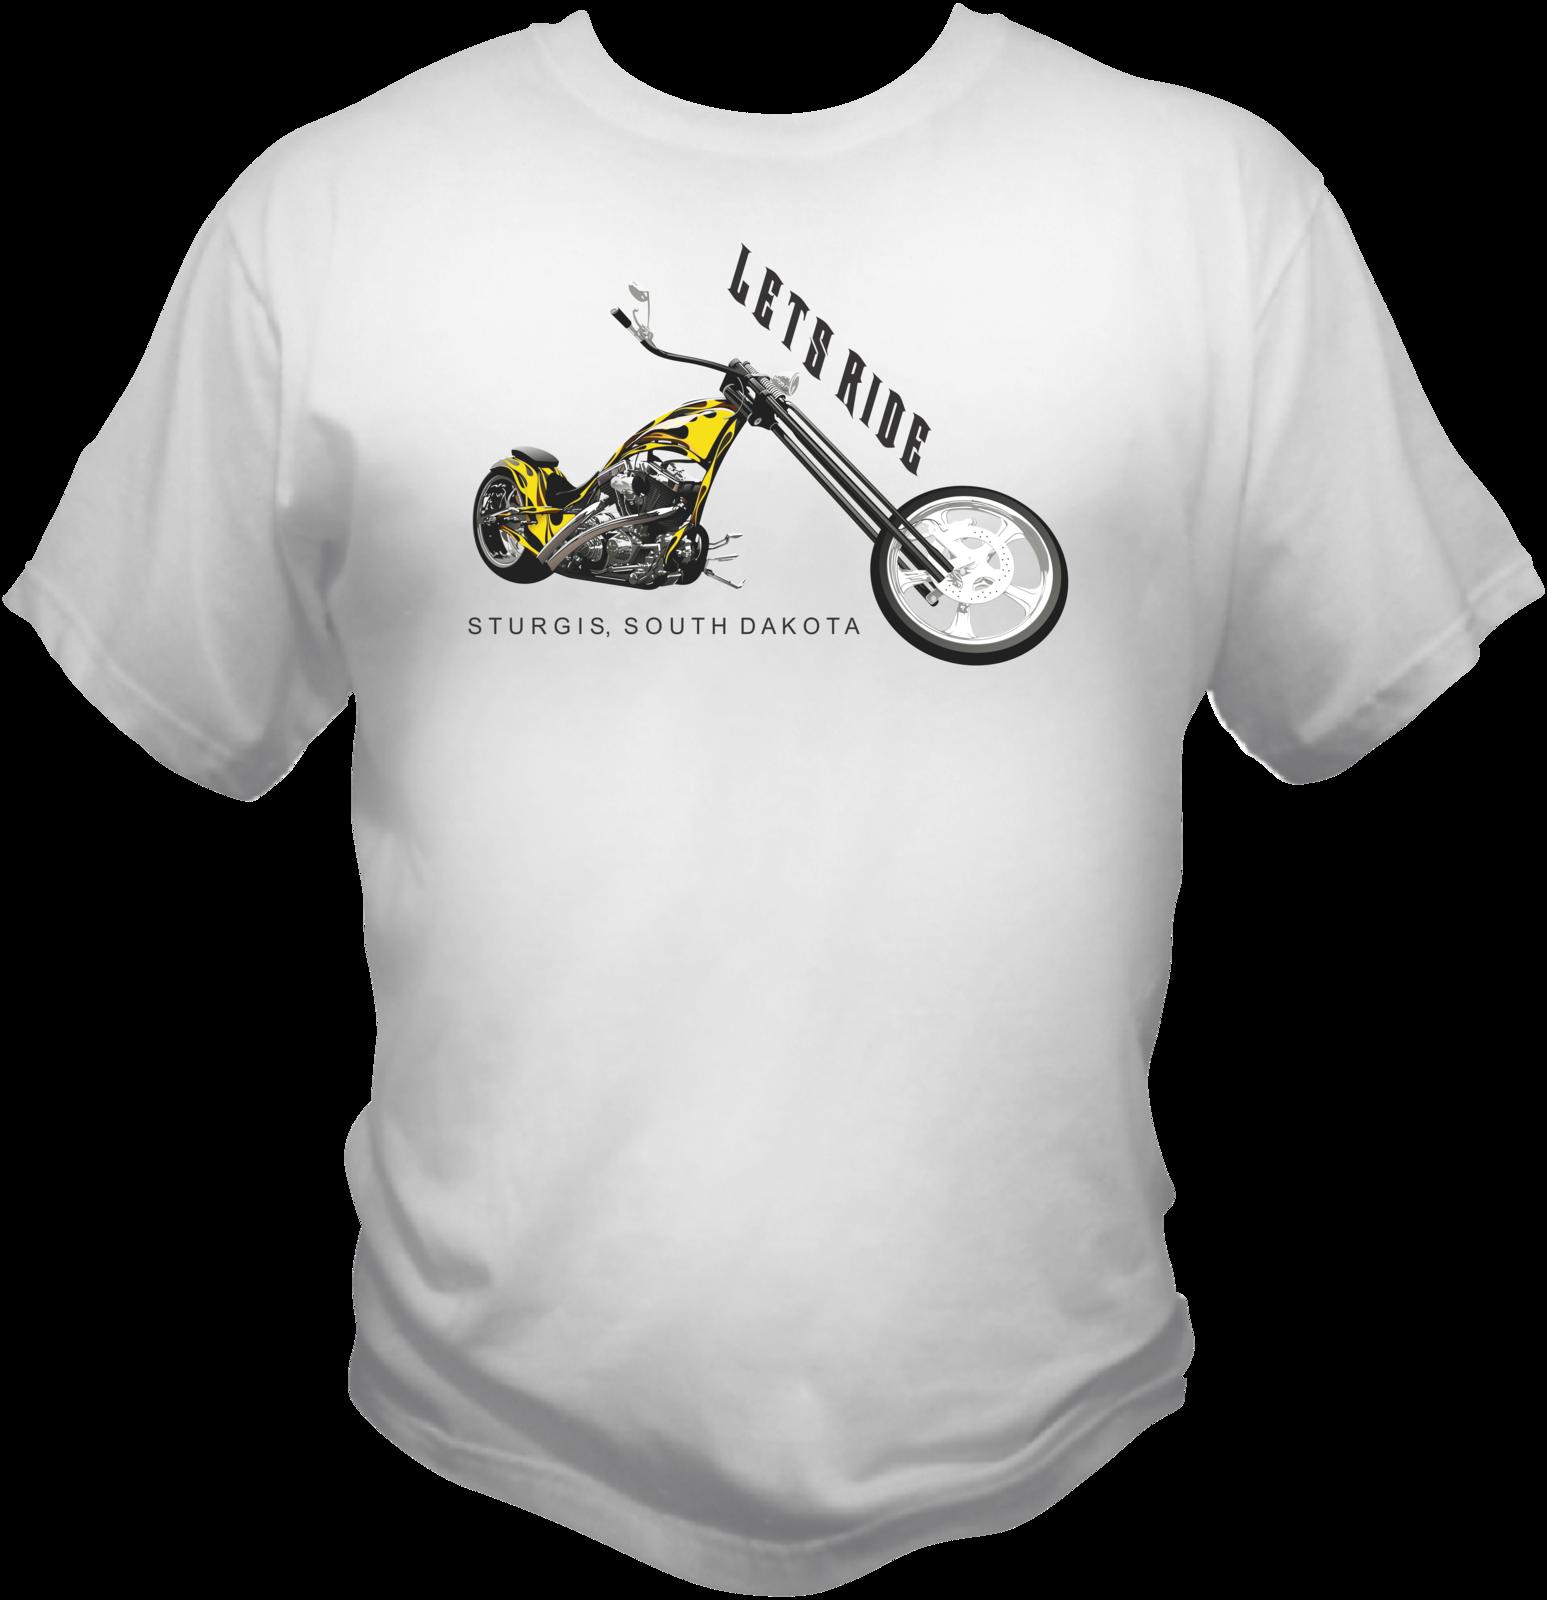 Sturgis bike